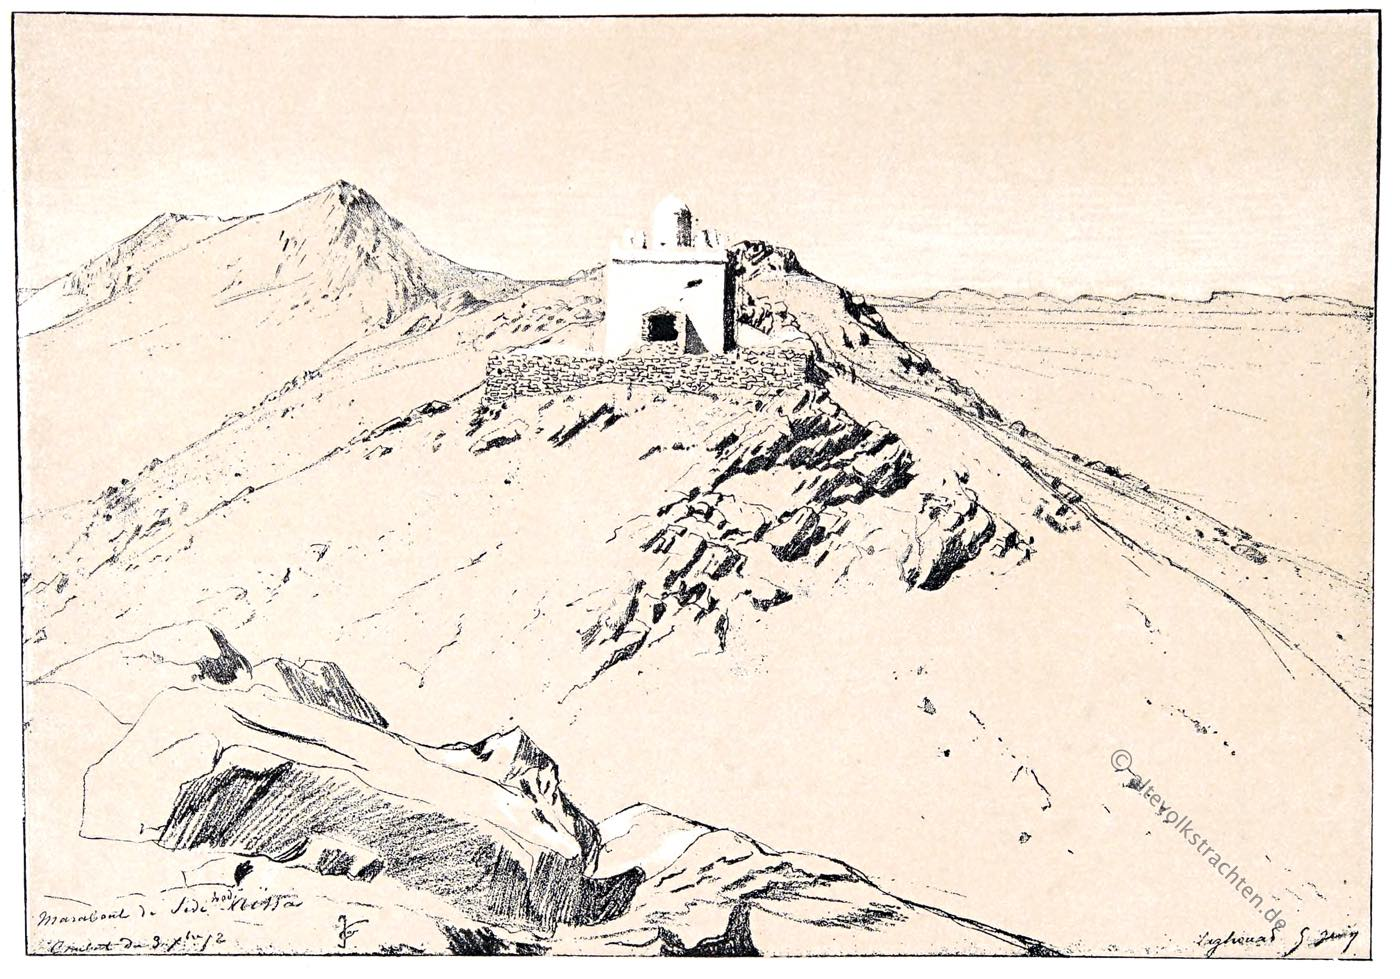 Marabou, Eugène Fromentin, Sufi, Heiliger, Grabmal, Wüste, Laghouat, Maghreb